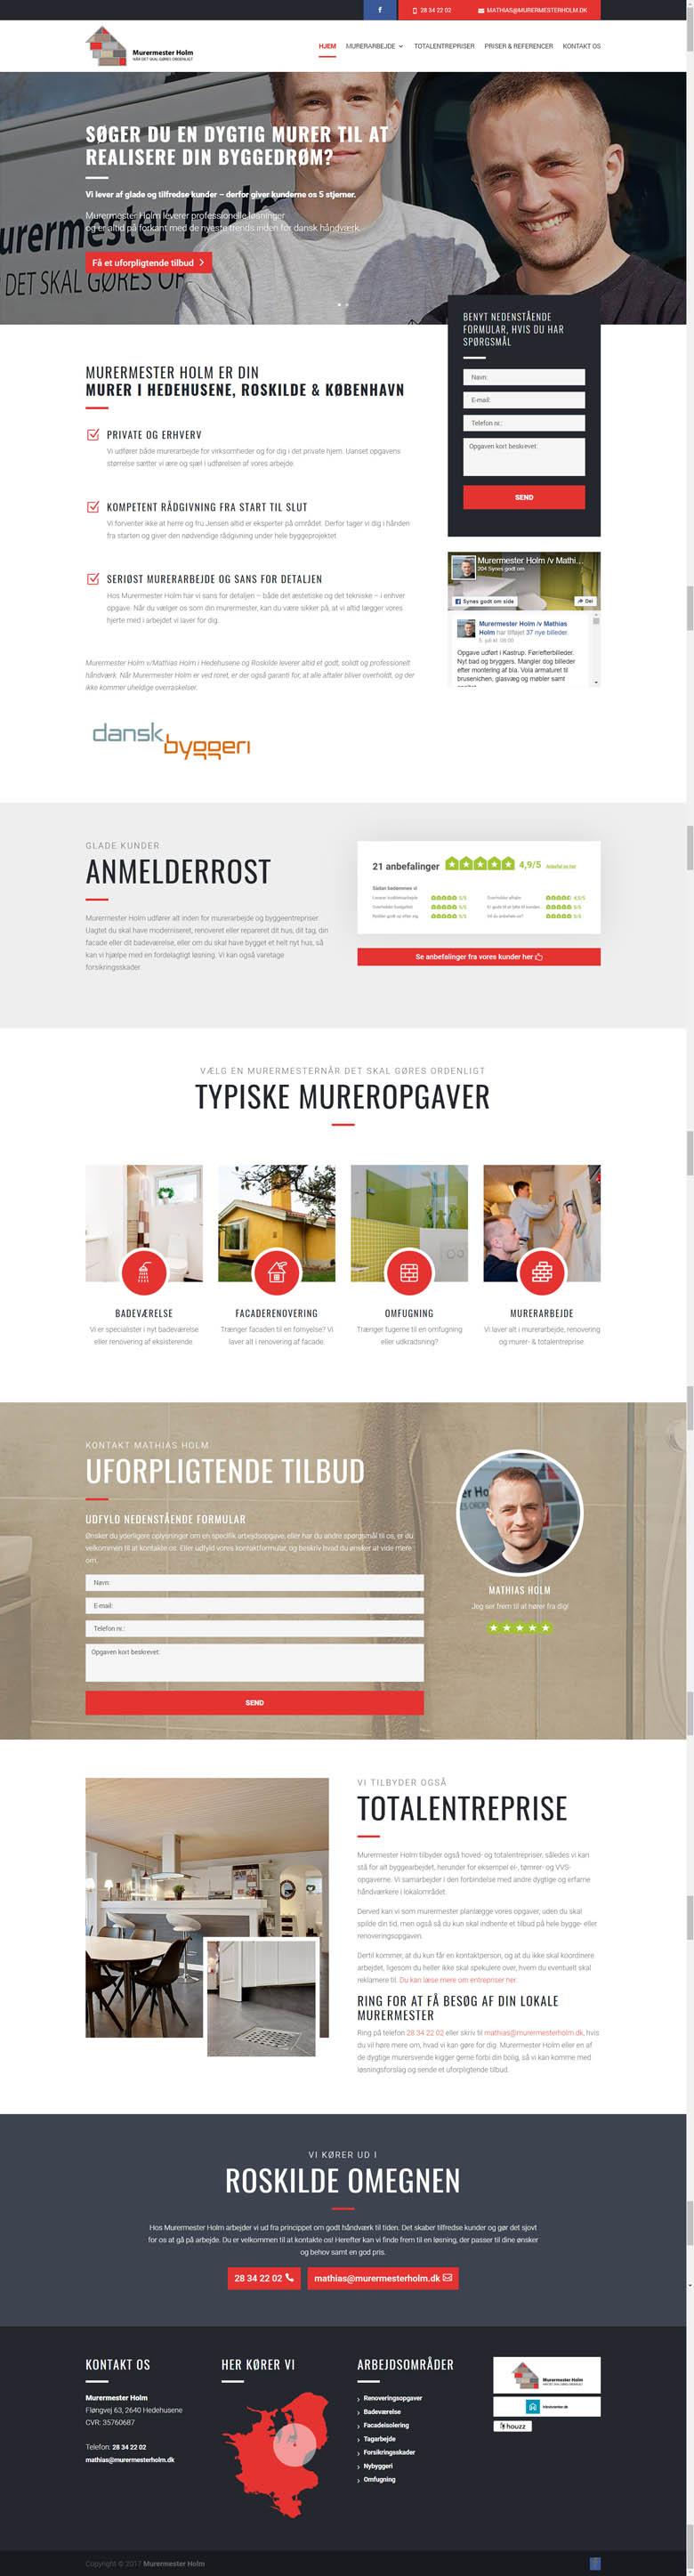 Webdesign reference